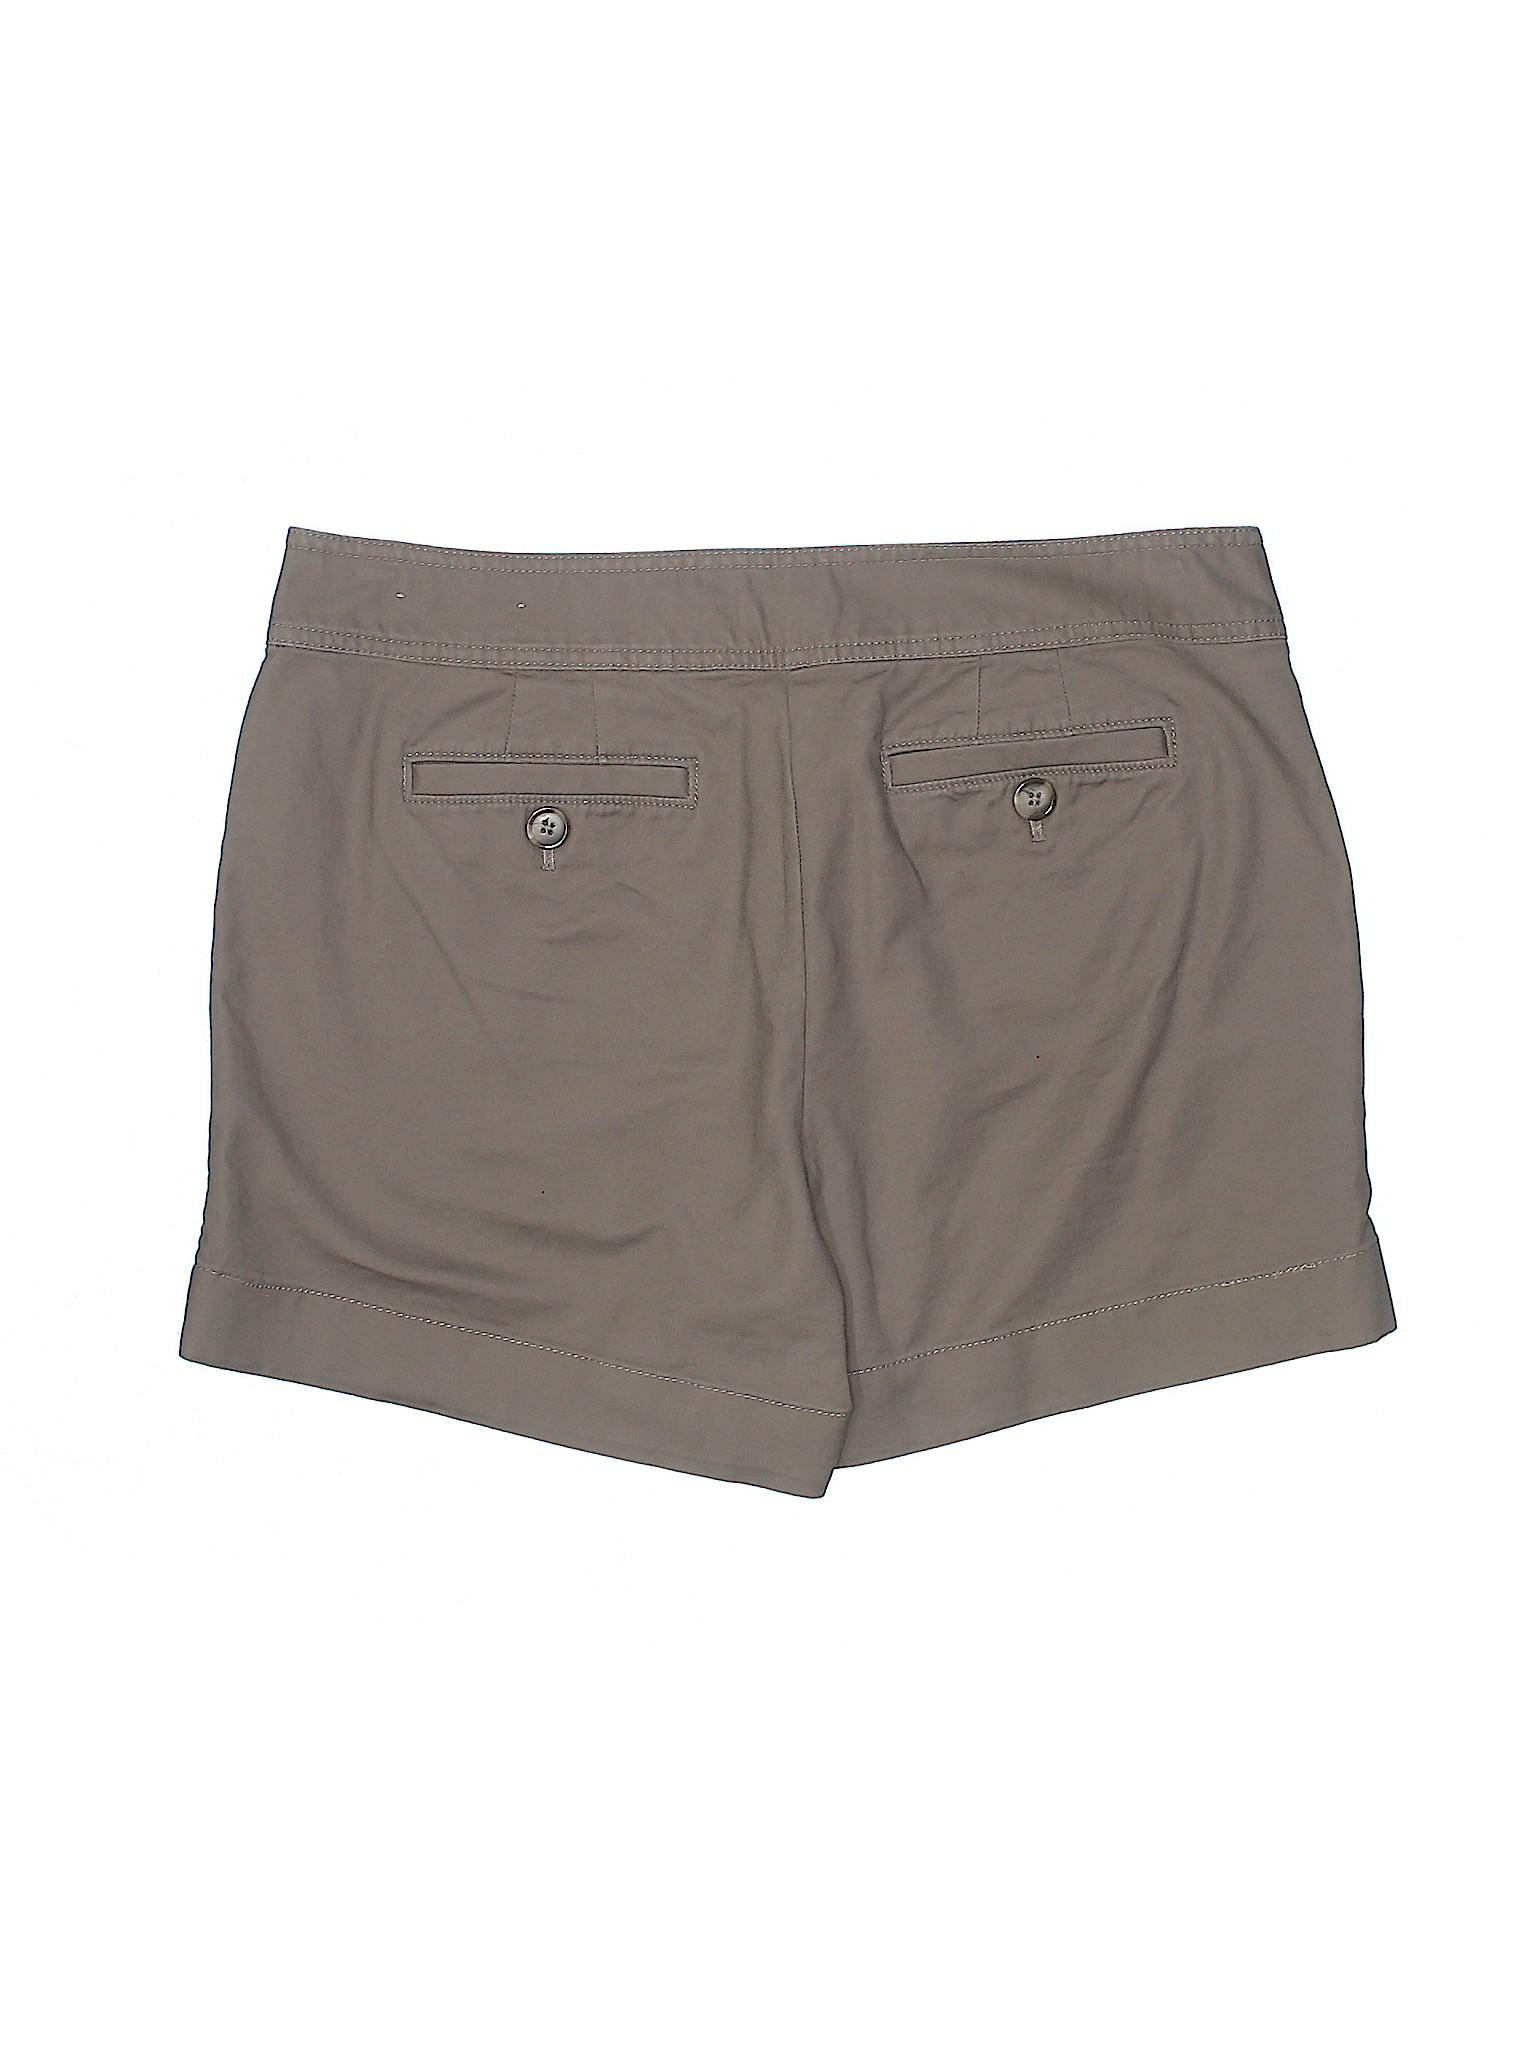 Loft Boutique Khaki Shorts Outlet Taylor Leisure Ann xqw00ZO4a